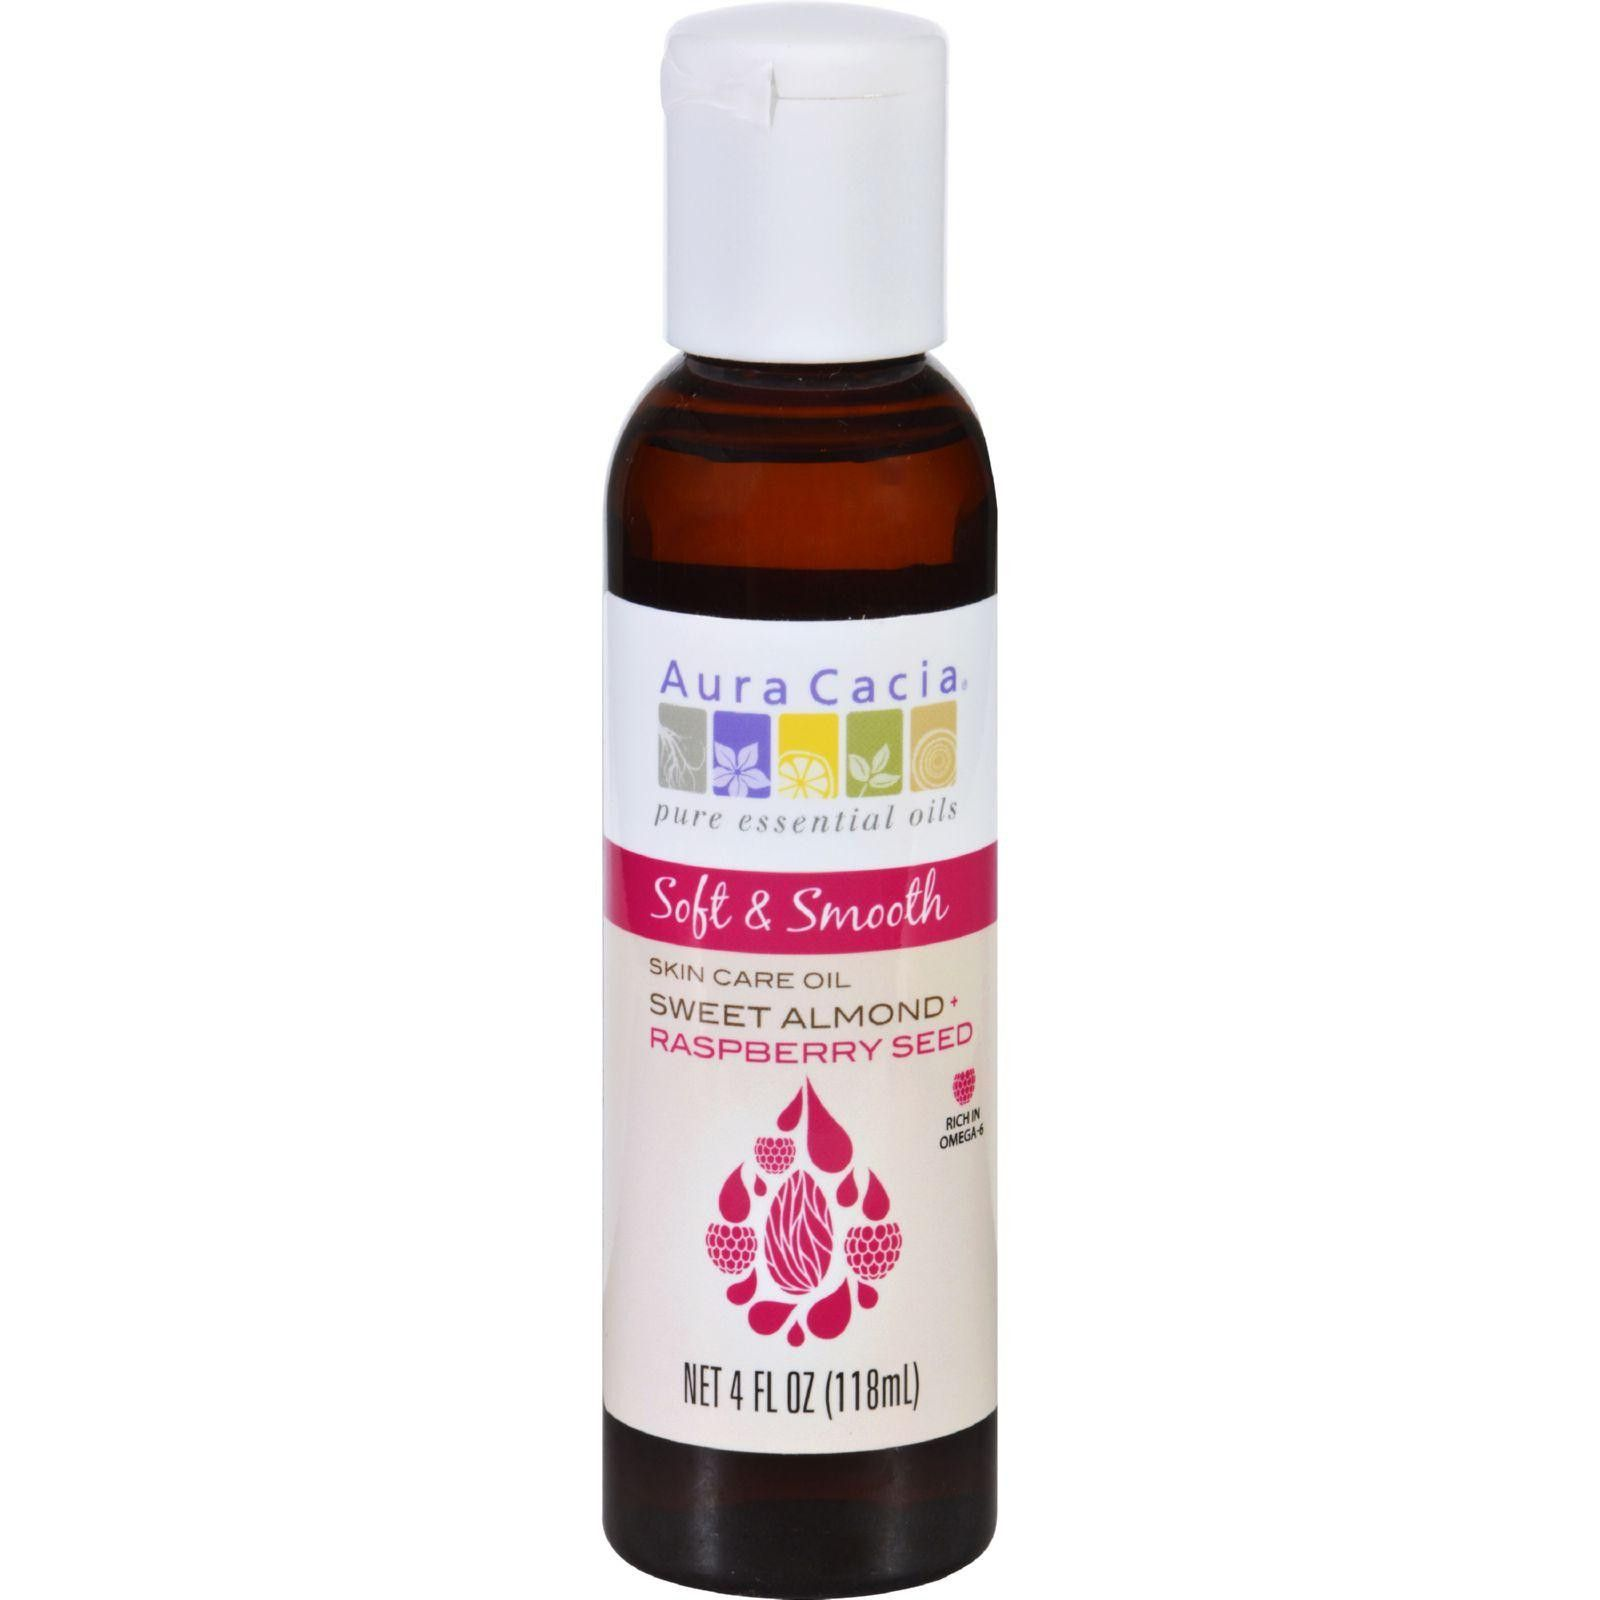 Aura Cacia Skin Care Oil Soft And Smooth Sweet Almond Plus Raspberry Seed 4 Oz Oil Skin Care Raspberry Seeds Aura Cacia